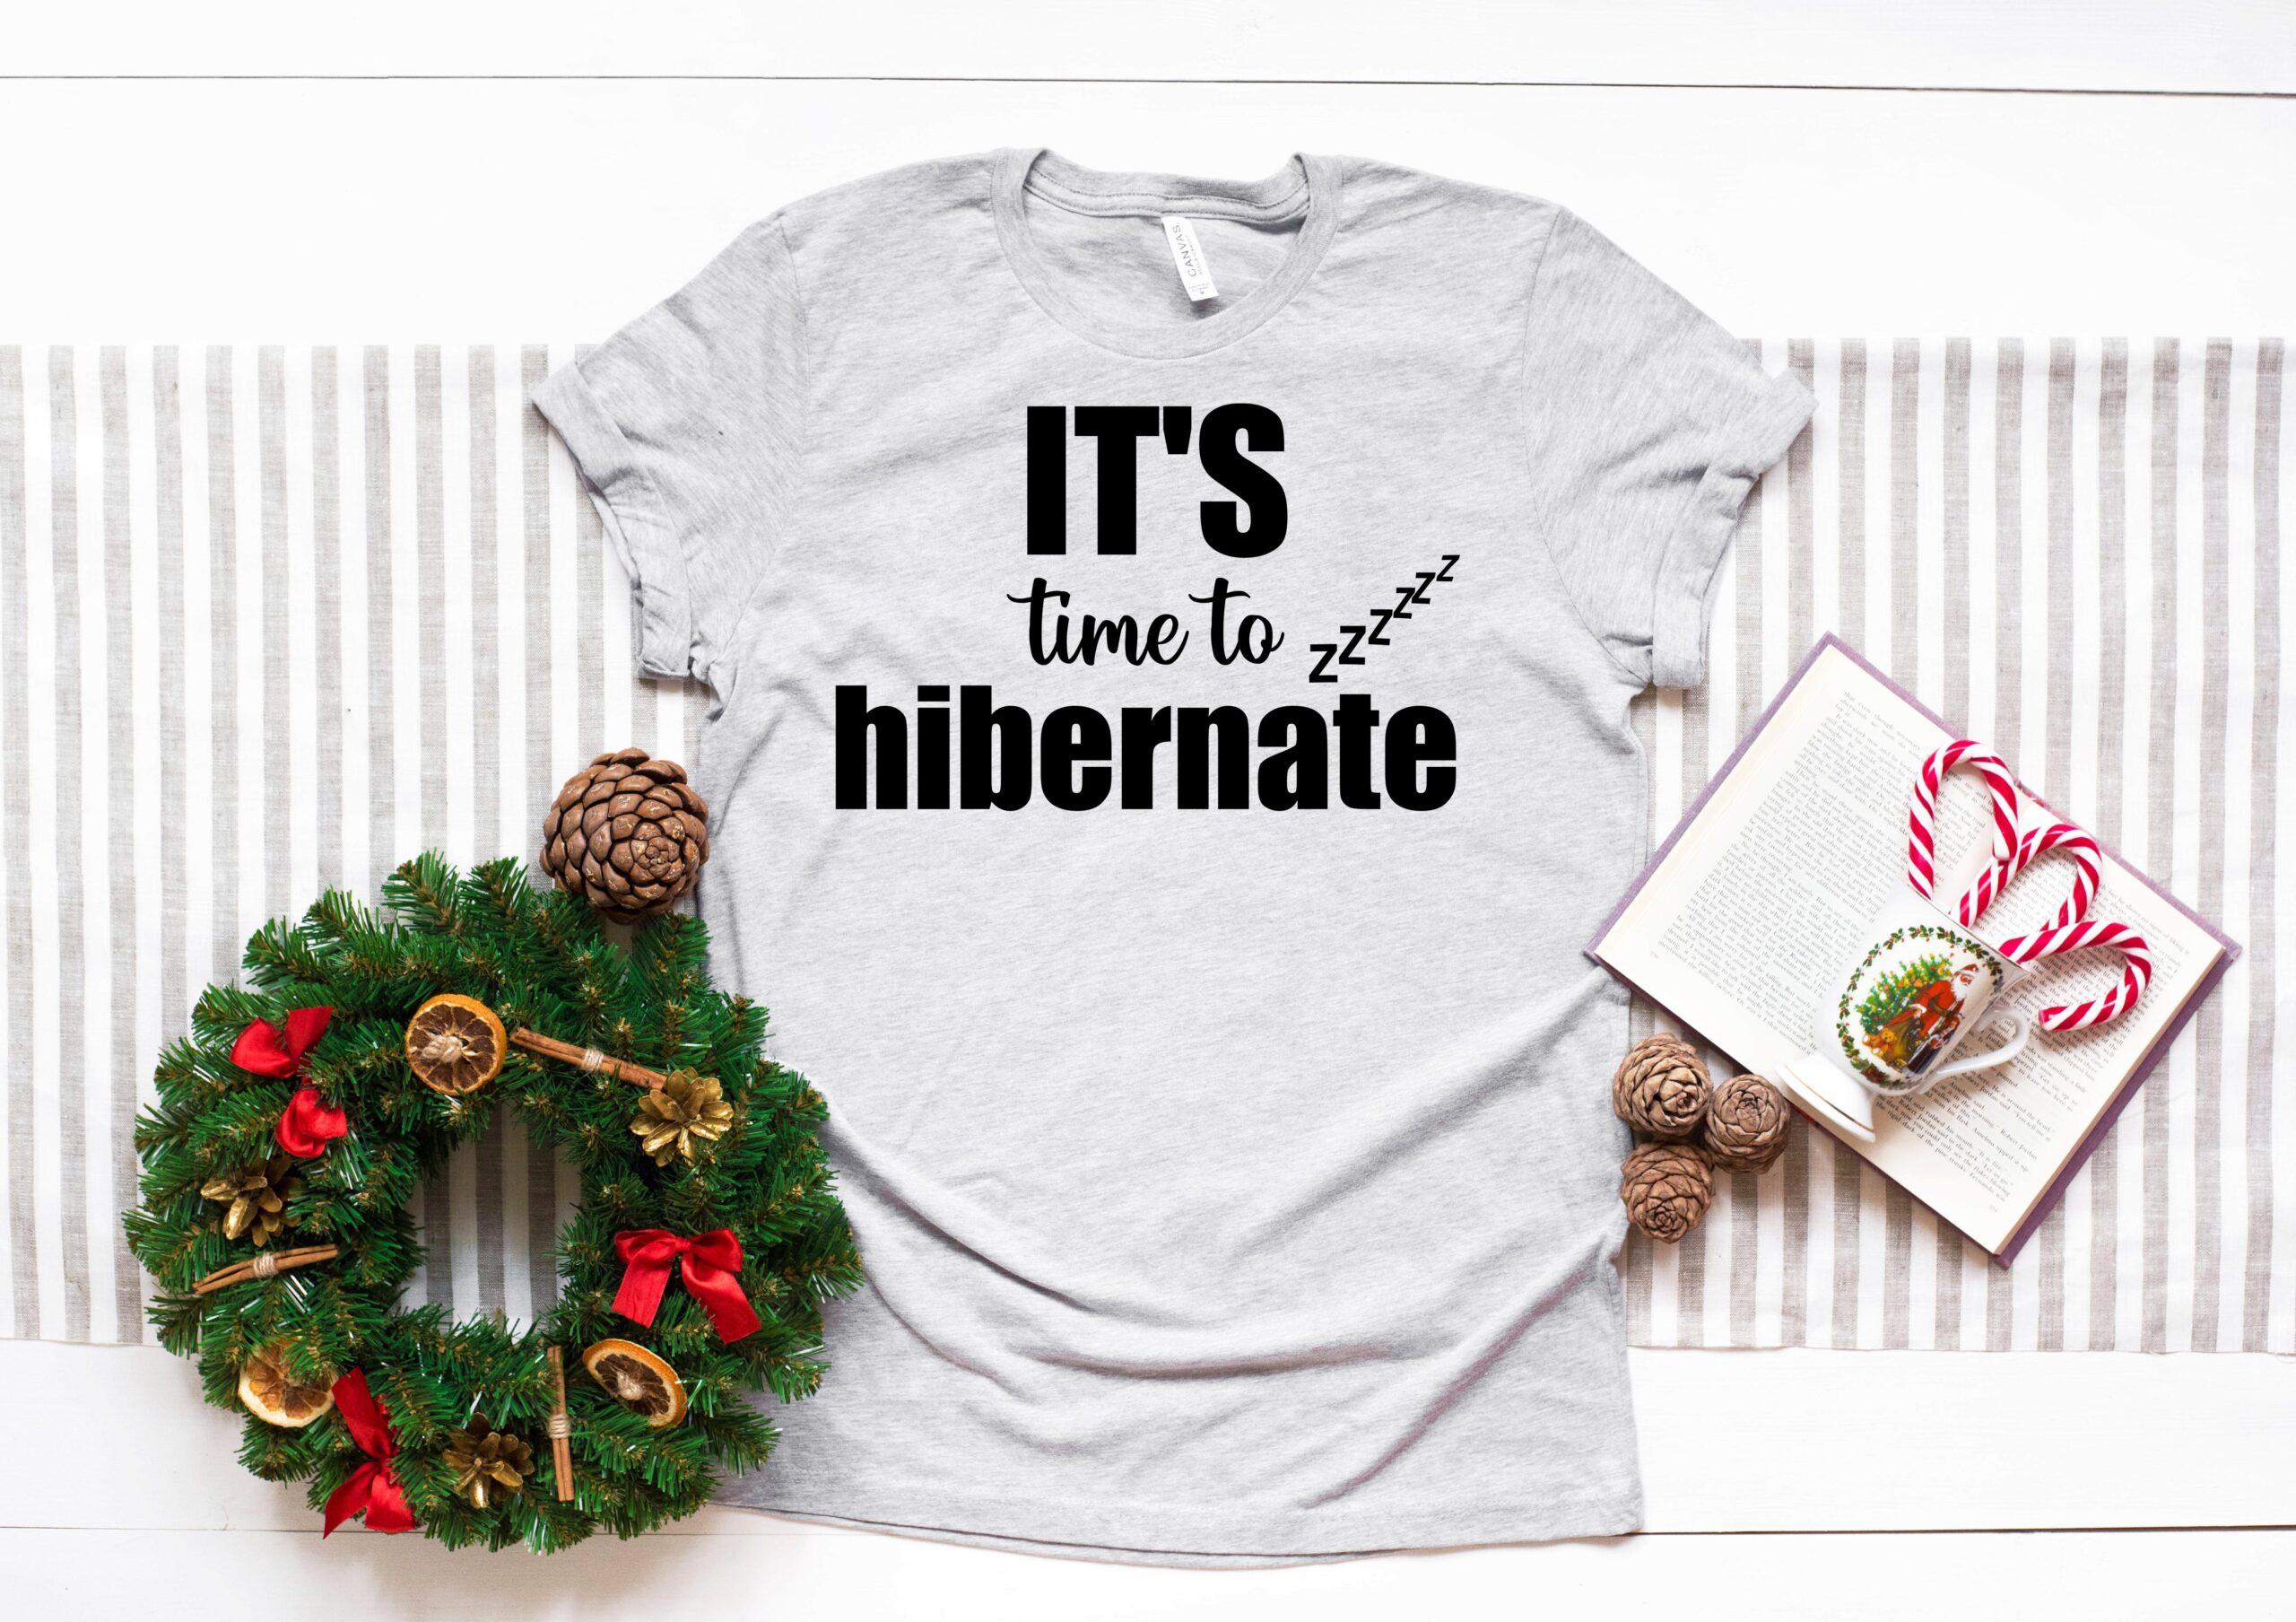 Free It's time to hibernate SVG File